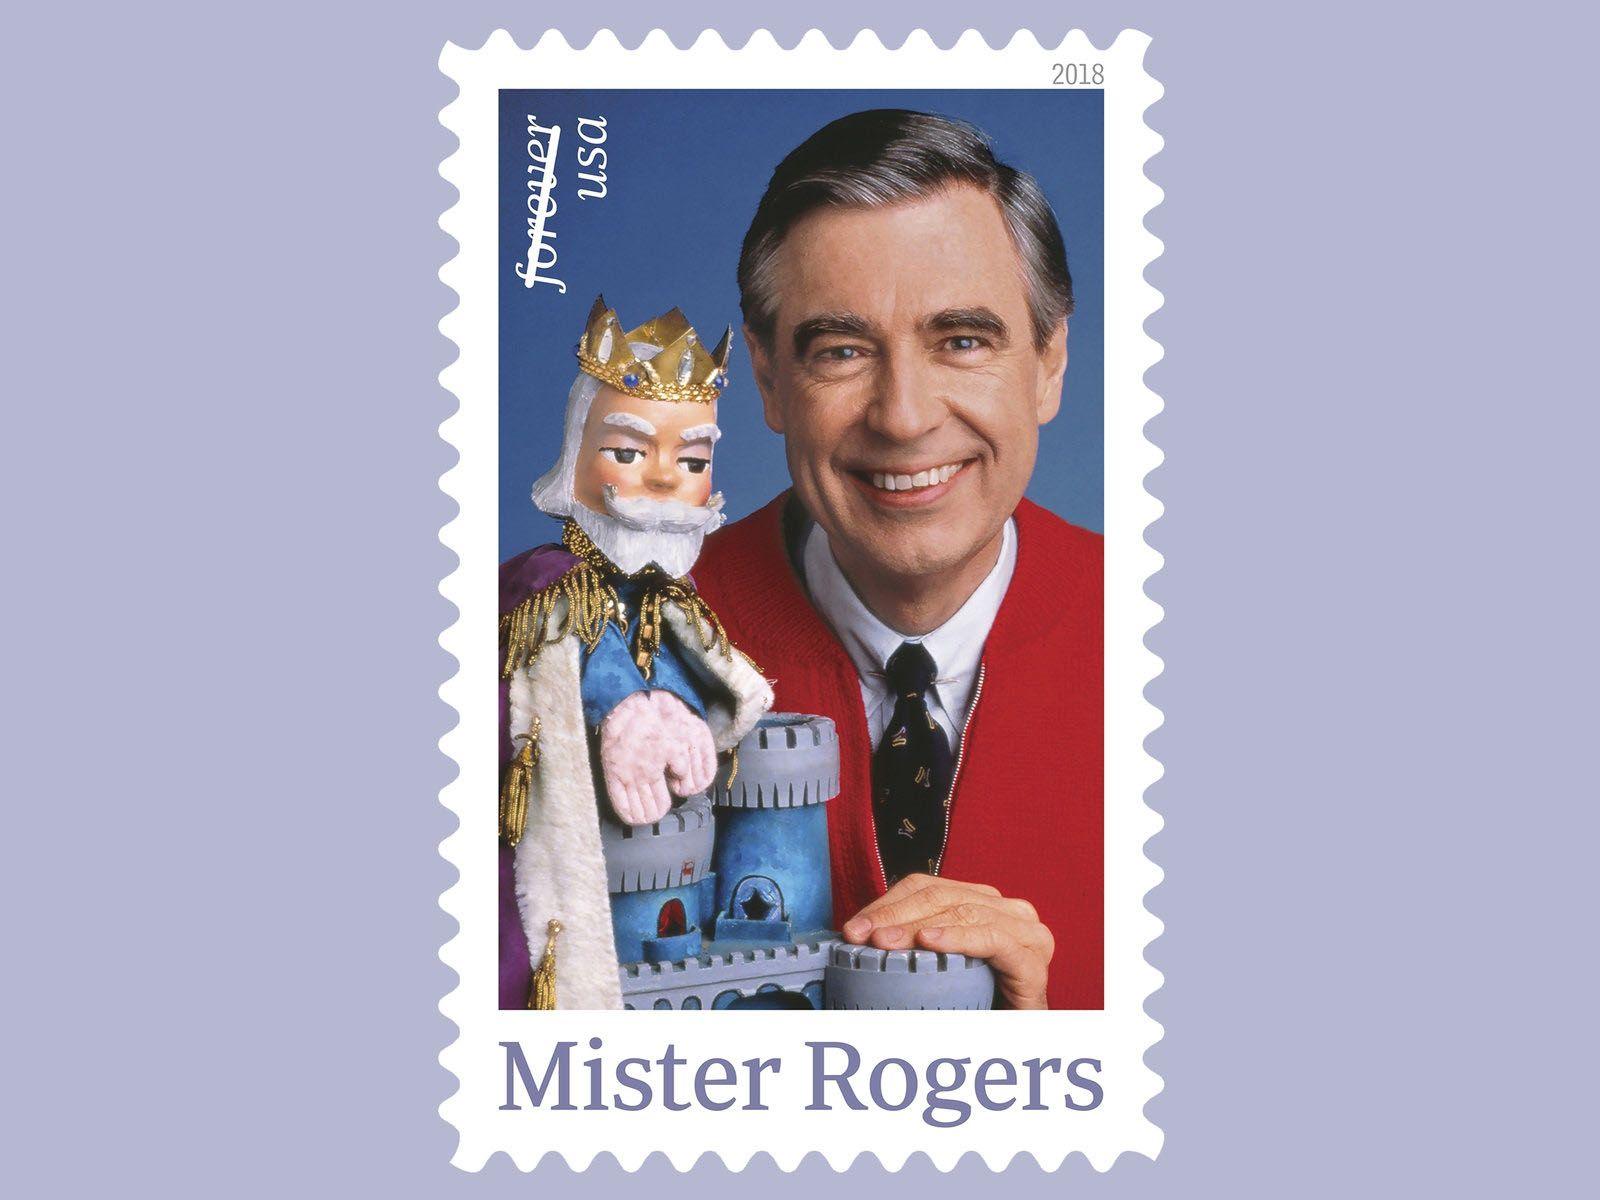 Mister Rogers commemorative U.S. postage stamp